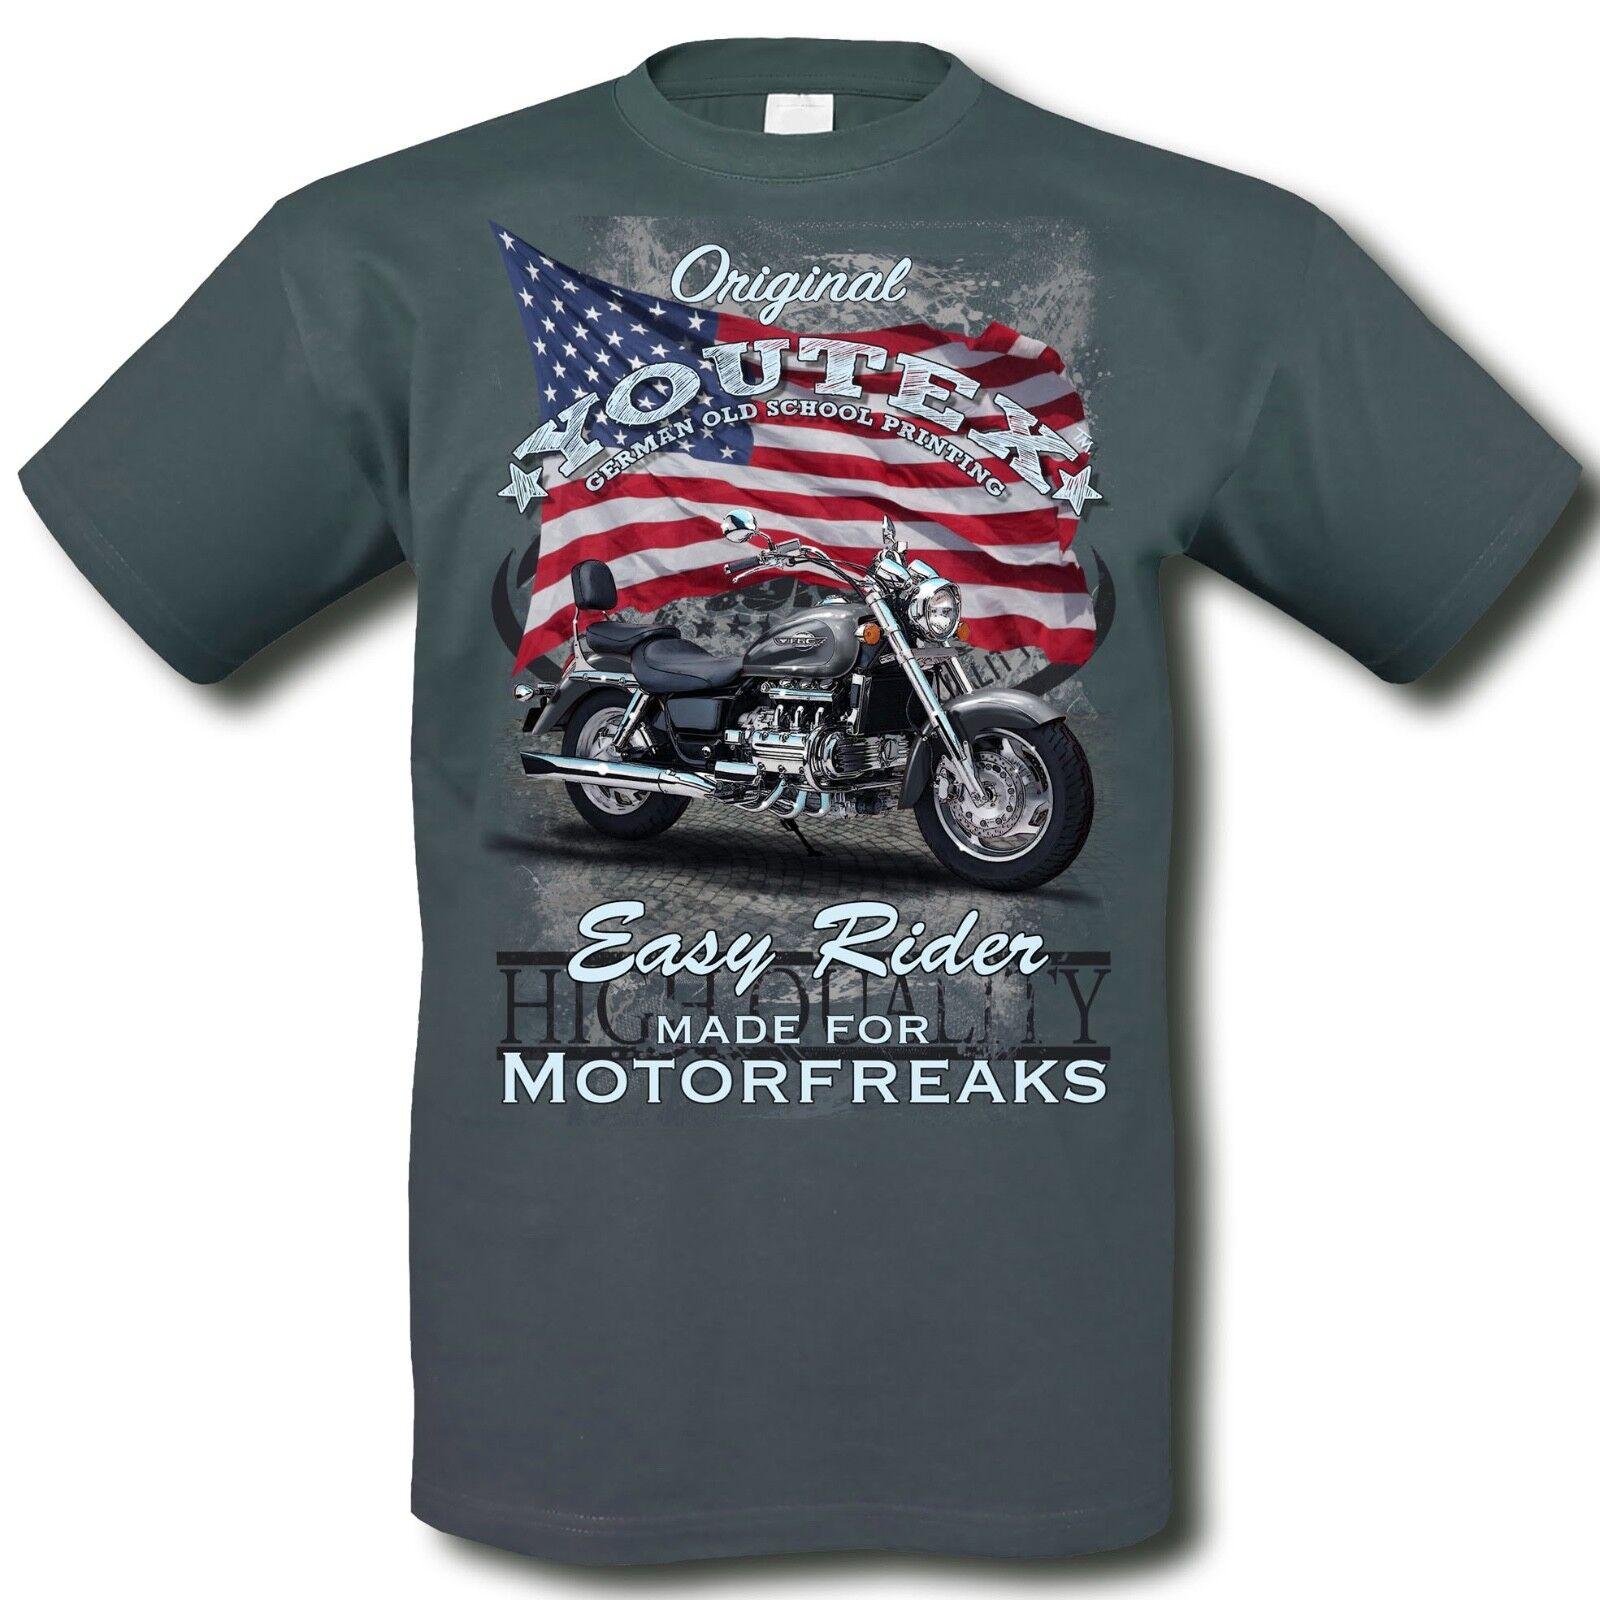 80aae2c300b207 HONDA VALKYRIE BIKE T-Shirt Shirt original YOUTEX F6C VINTAGE ...